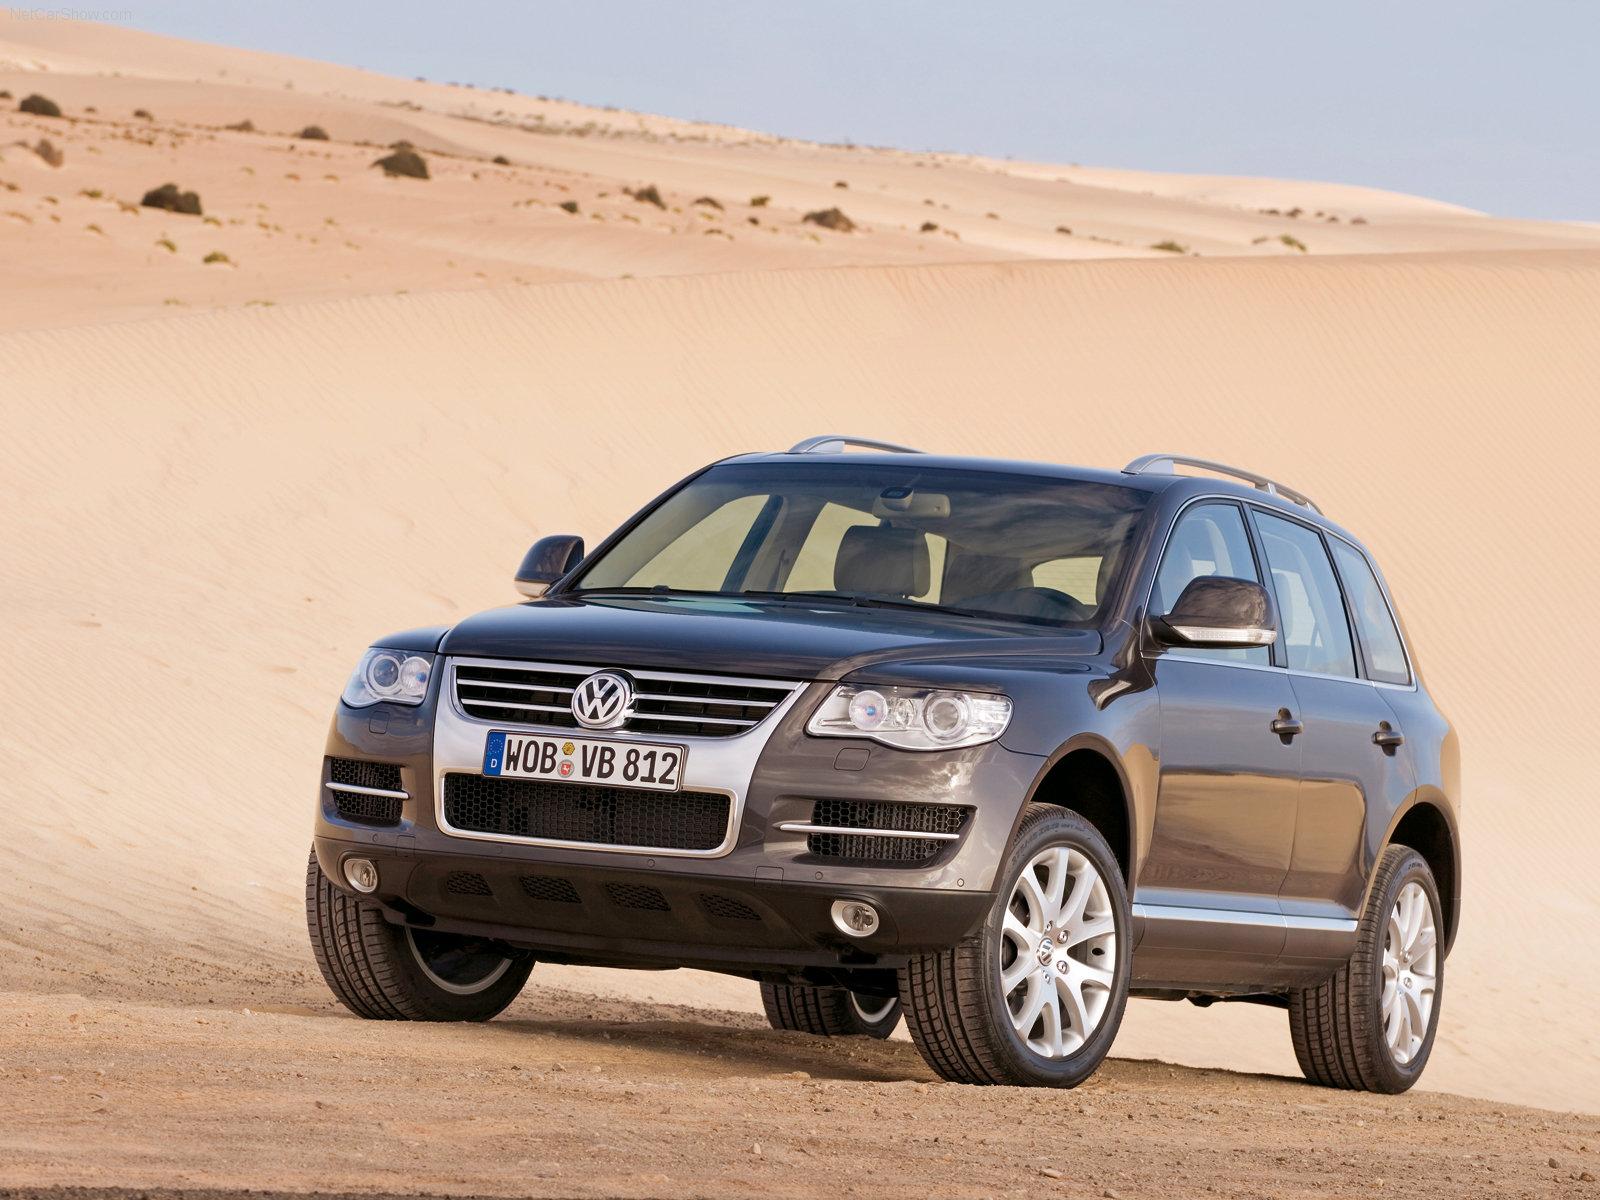 https://w04.ru/foto/Volkswagen-Touareg_2007_1600x1200_wallpaper_03.jpg